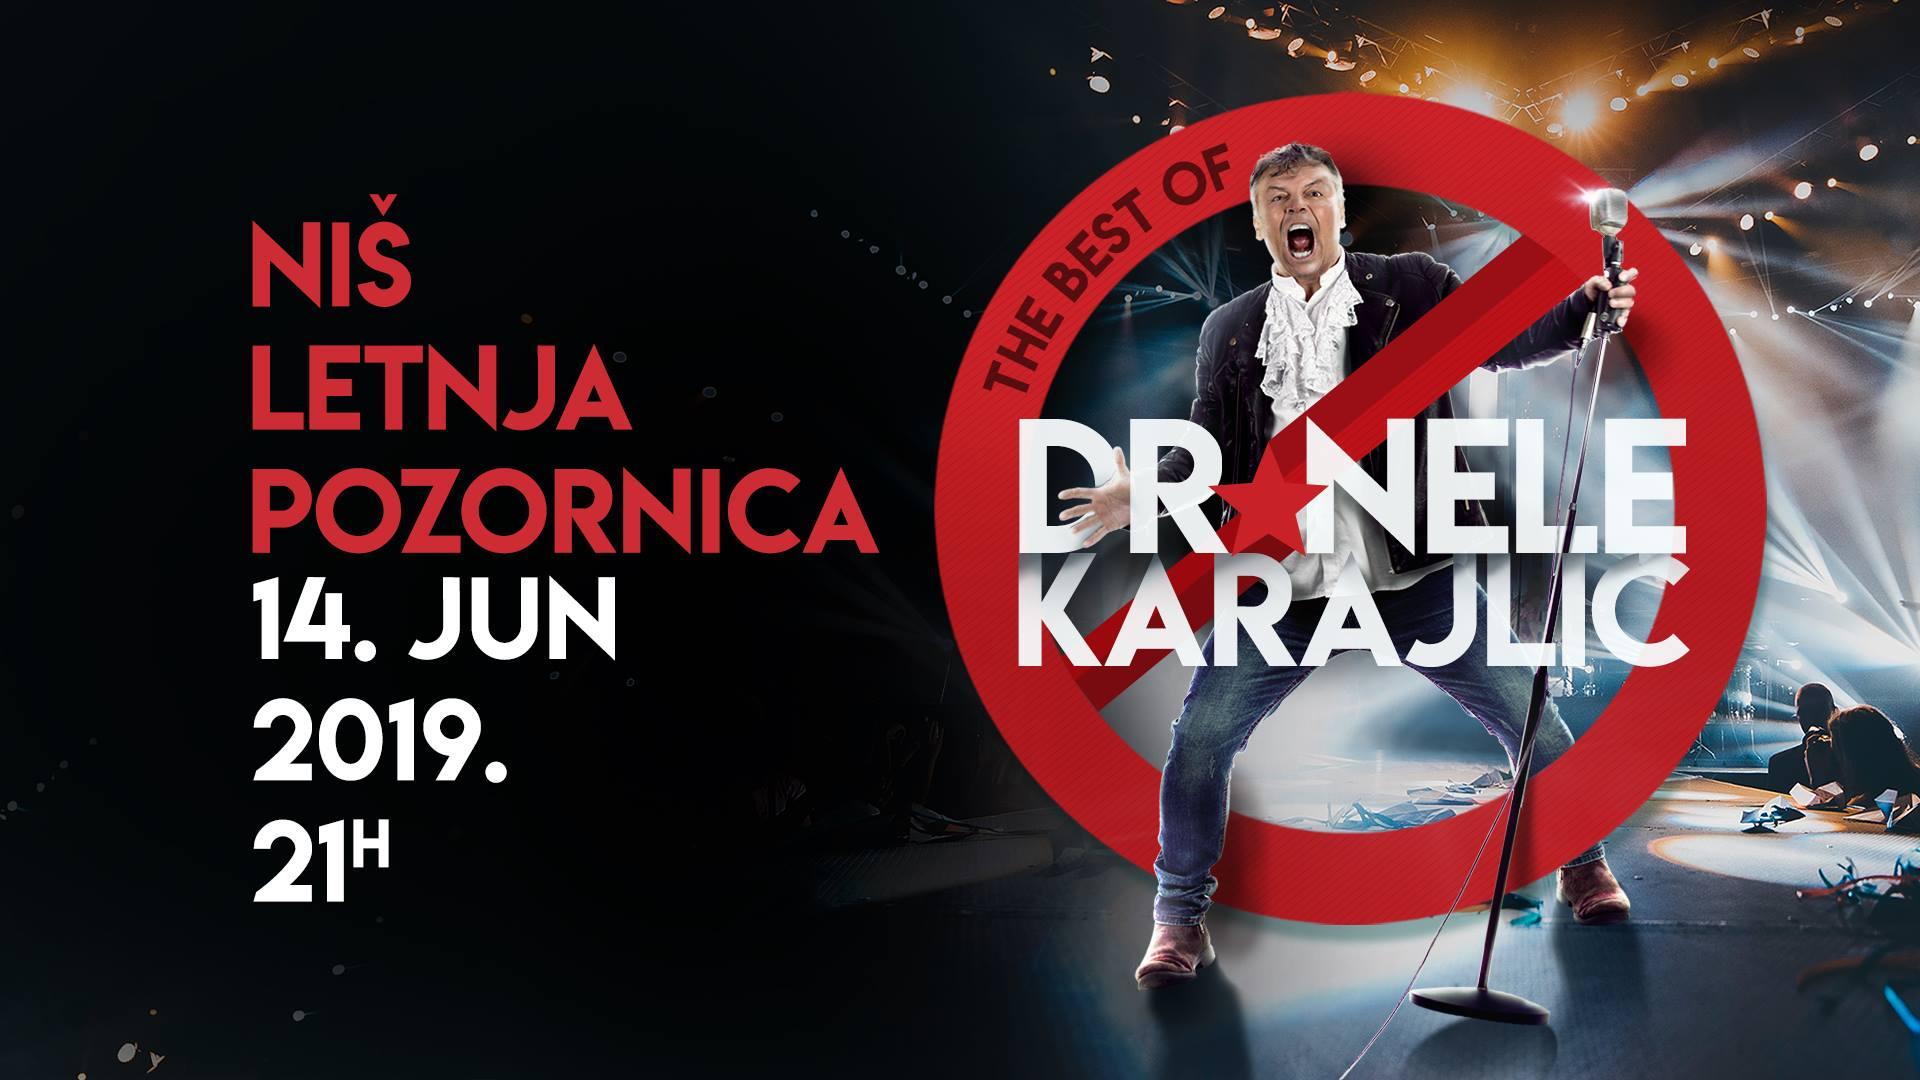 The Best Of Dr Nele Karajlić Tour - Letnja Pozornica Niš